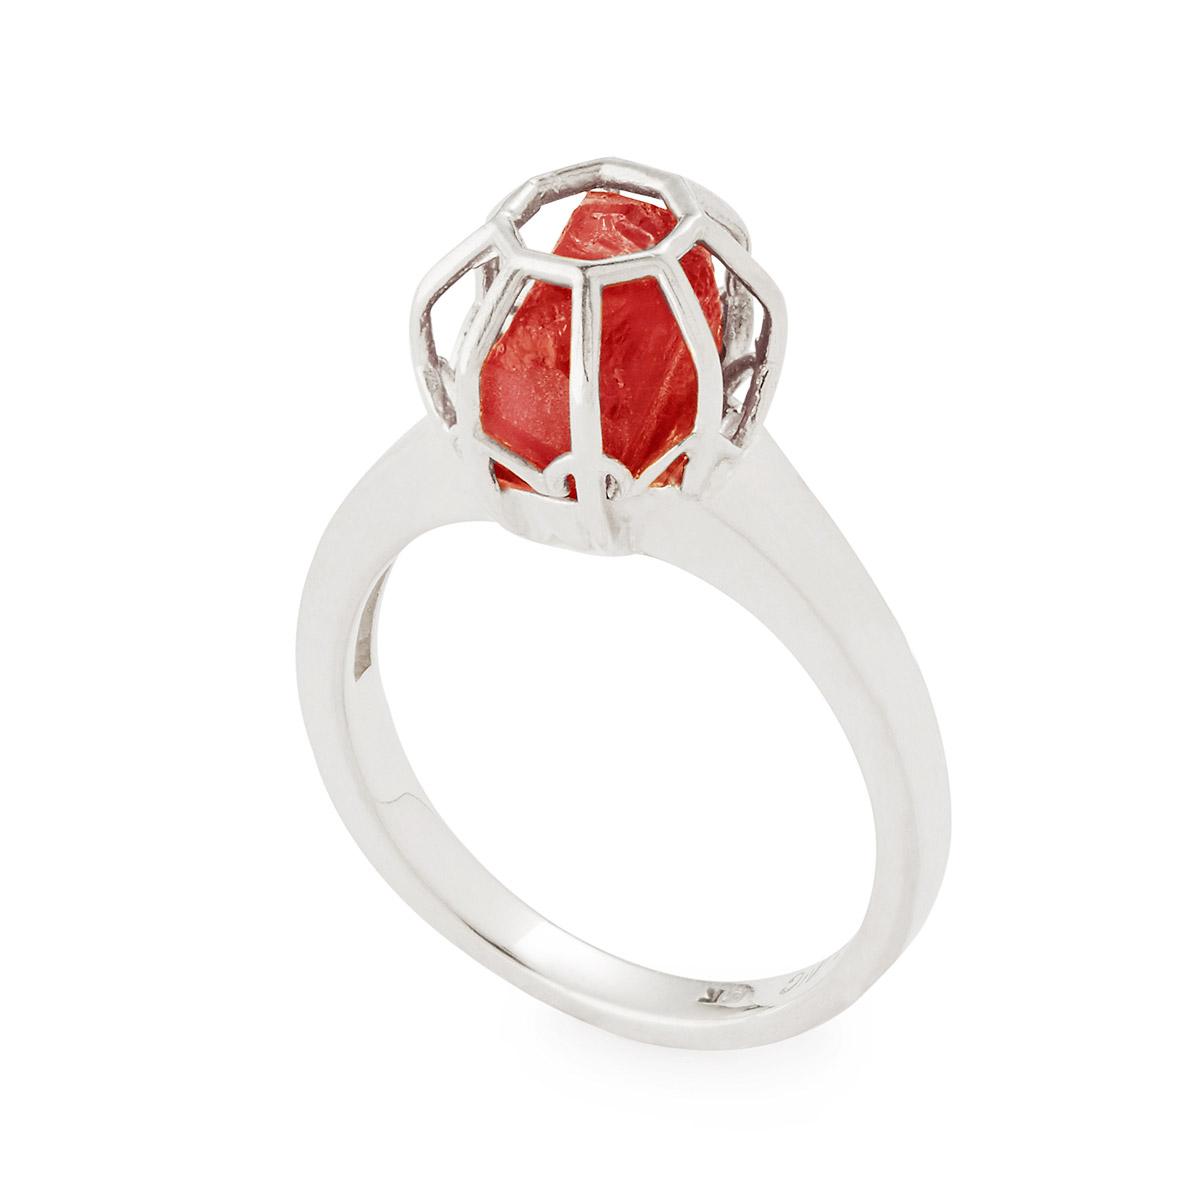 Rough Pink Tourmaline Stone Ring | UncommonGoods